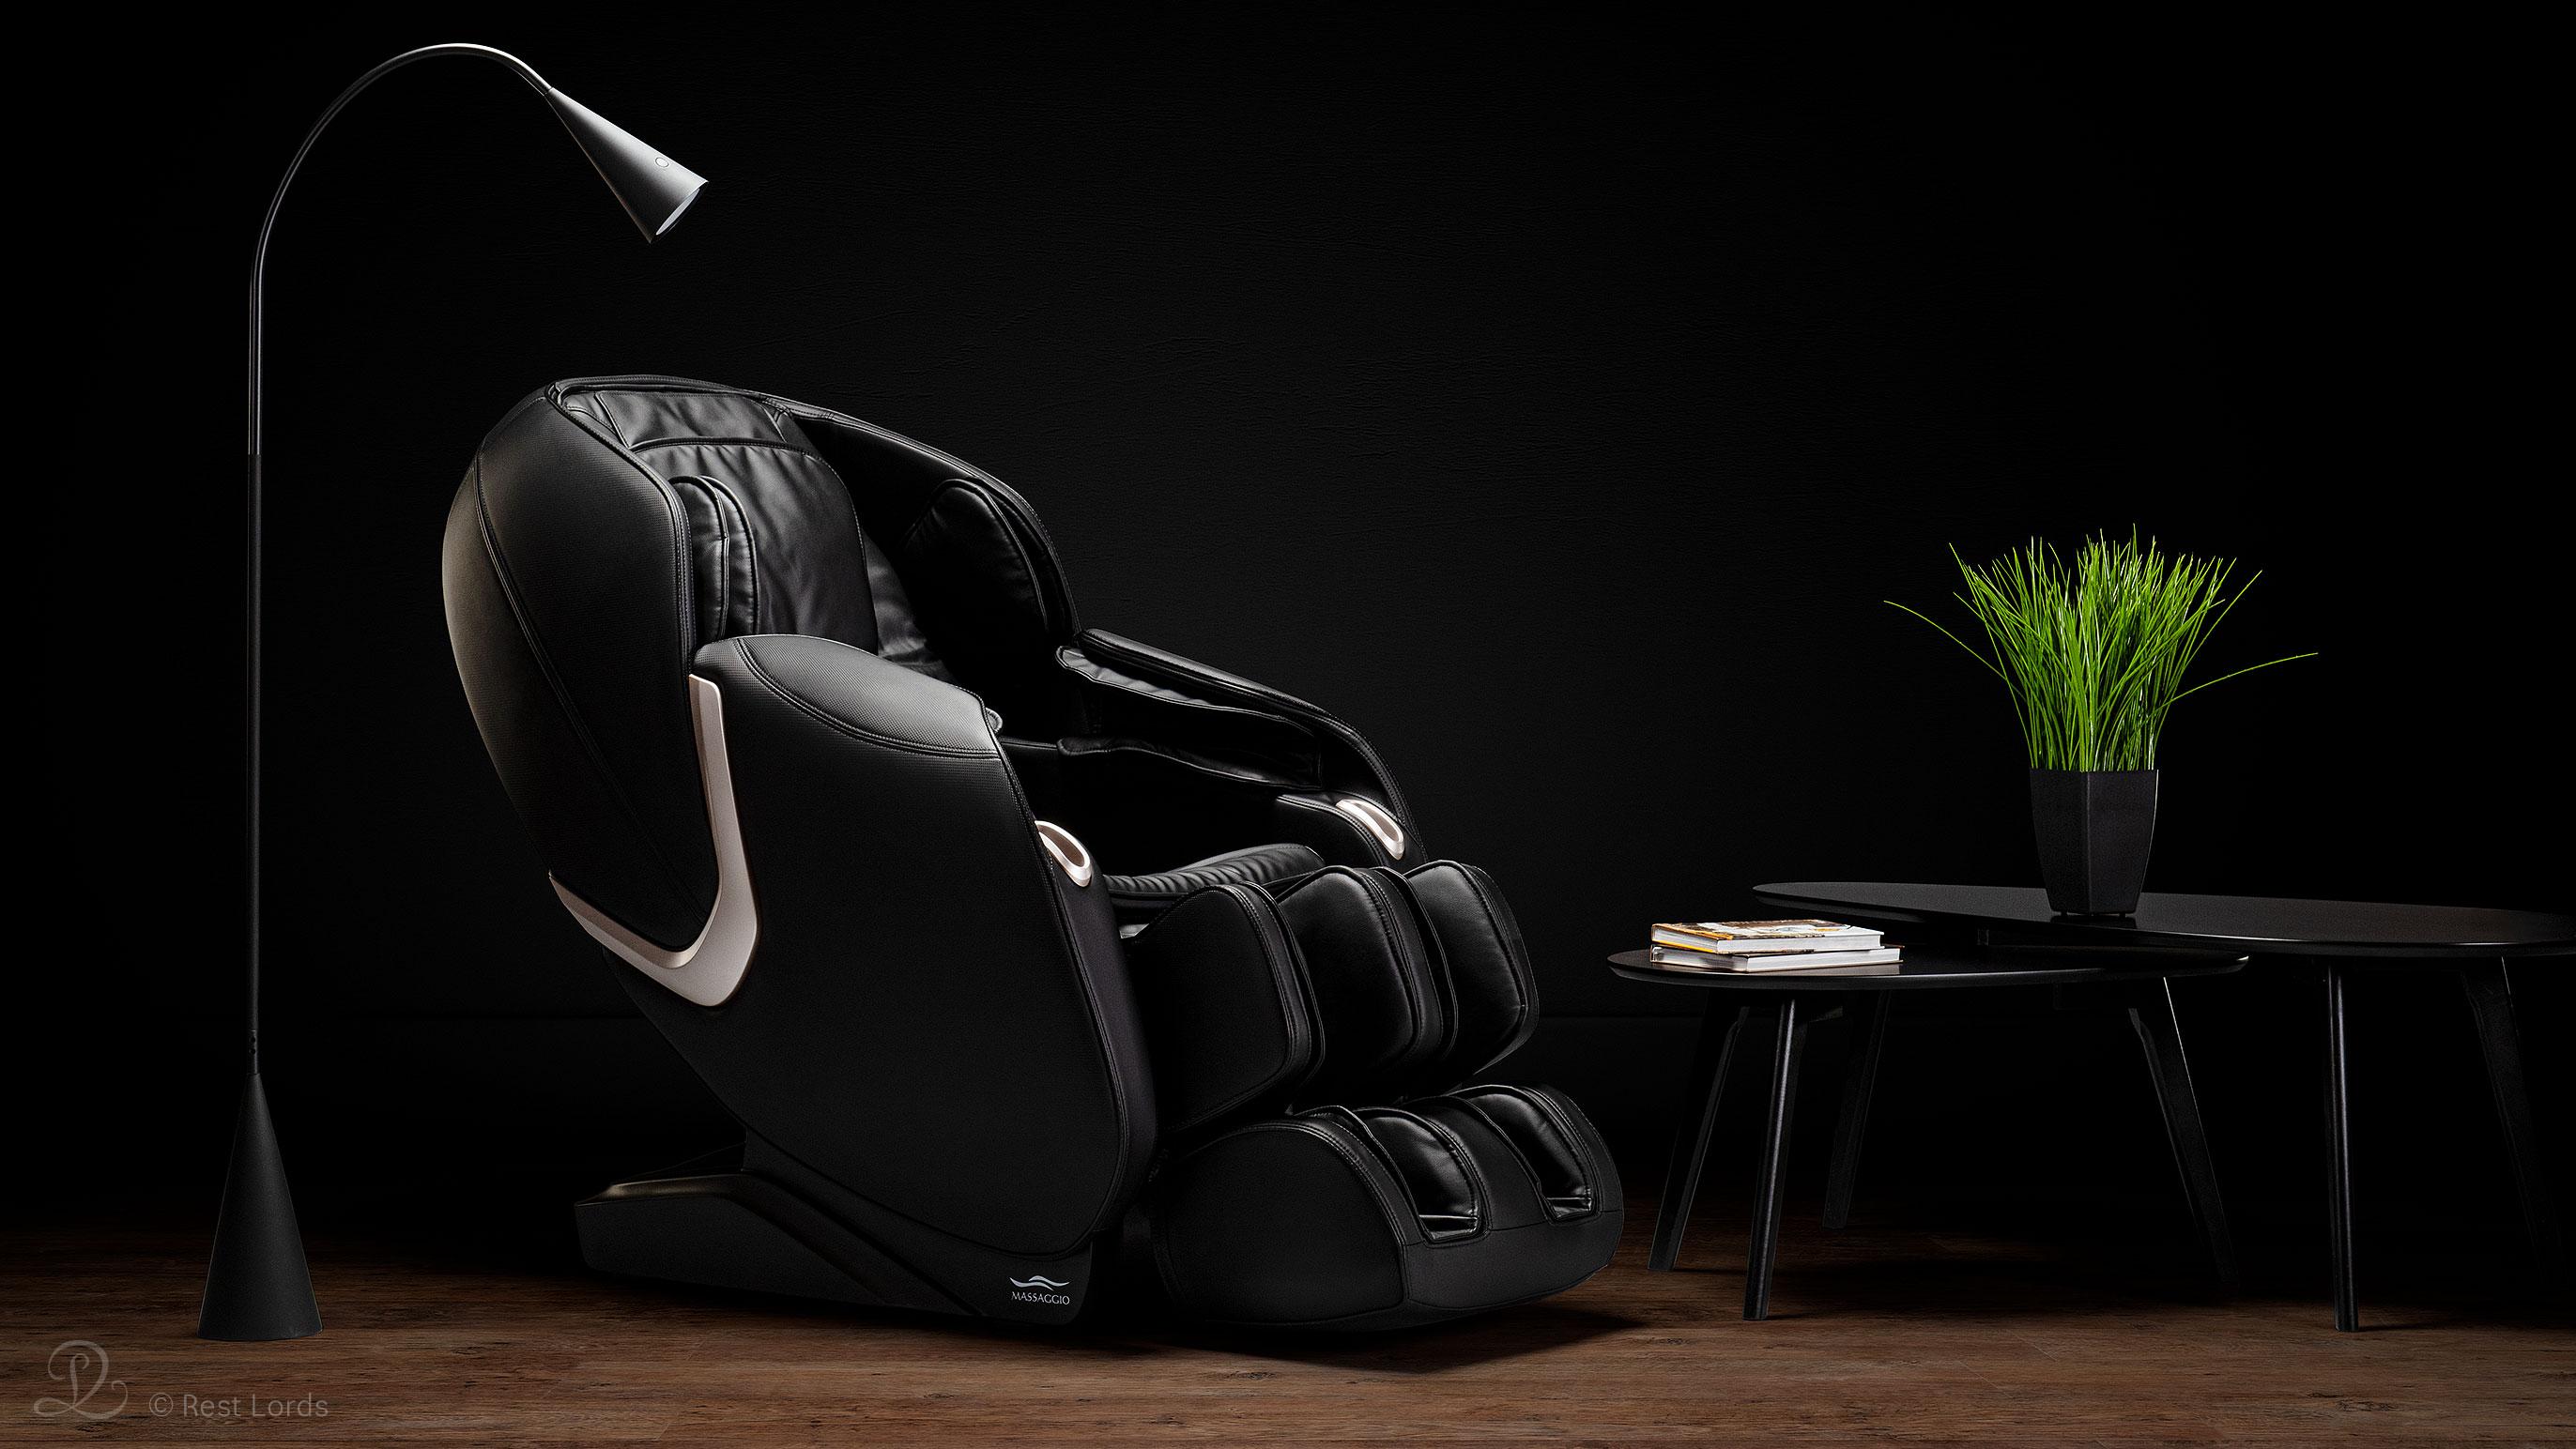 Fotel Masujacy Massaggio Eccellente 2 PRO aranżacja